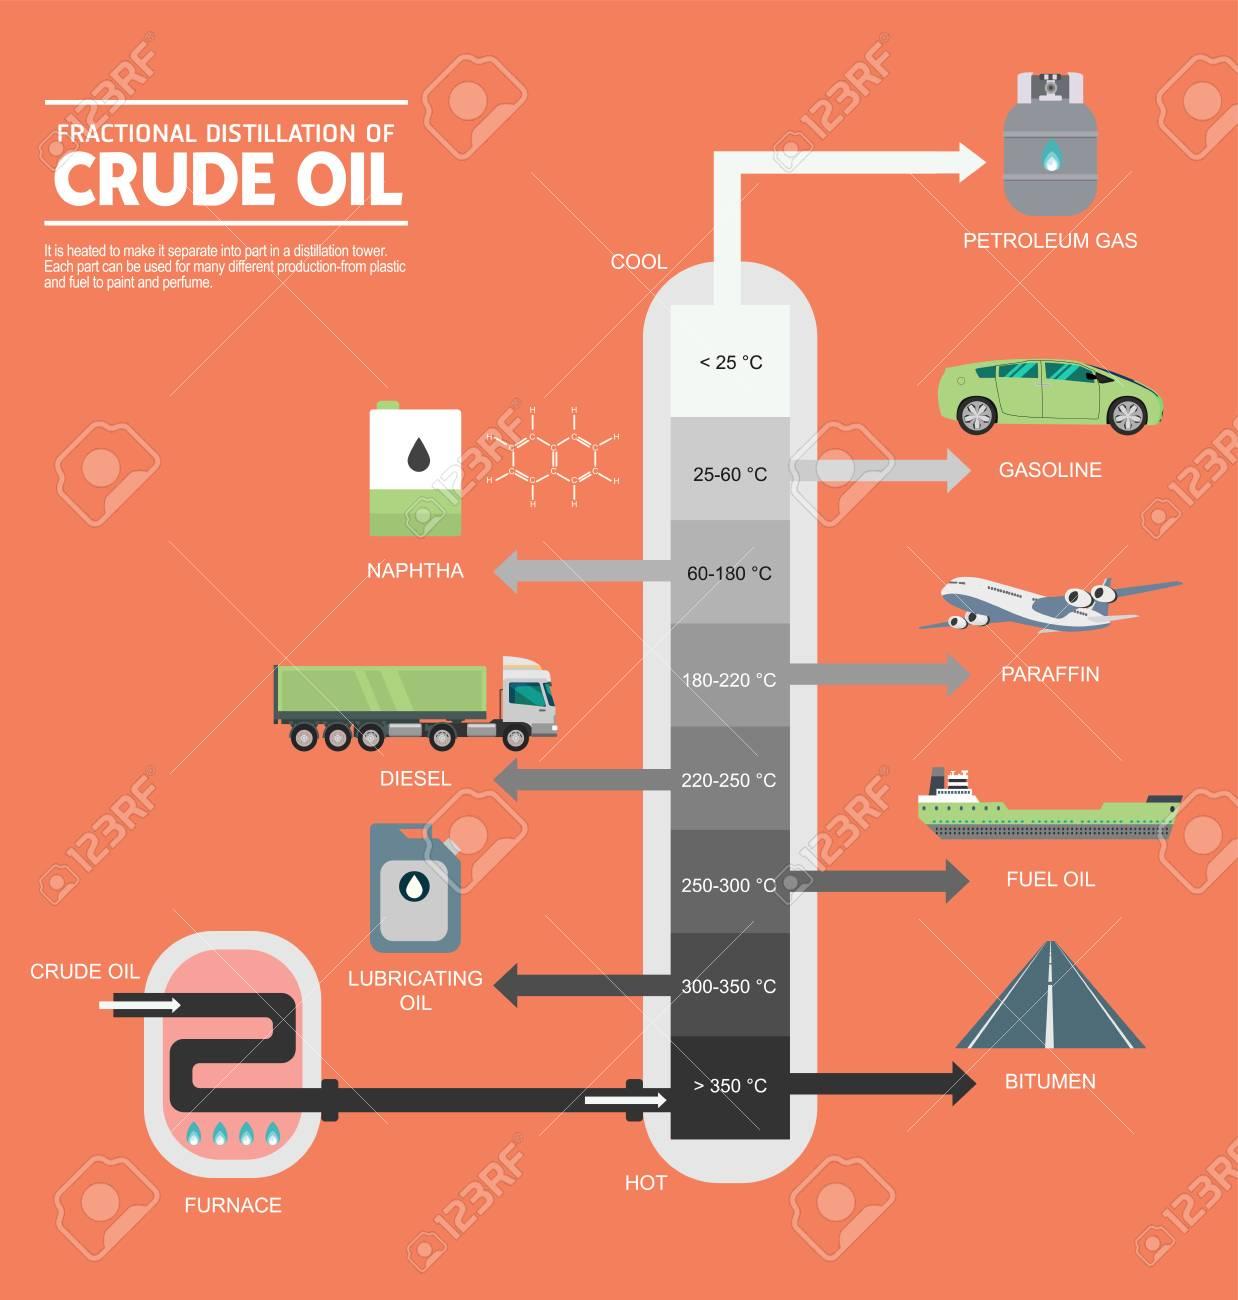 hight resolution of fractional distillation of crude oil diagram illustration stock vector 89121089